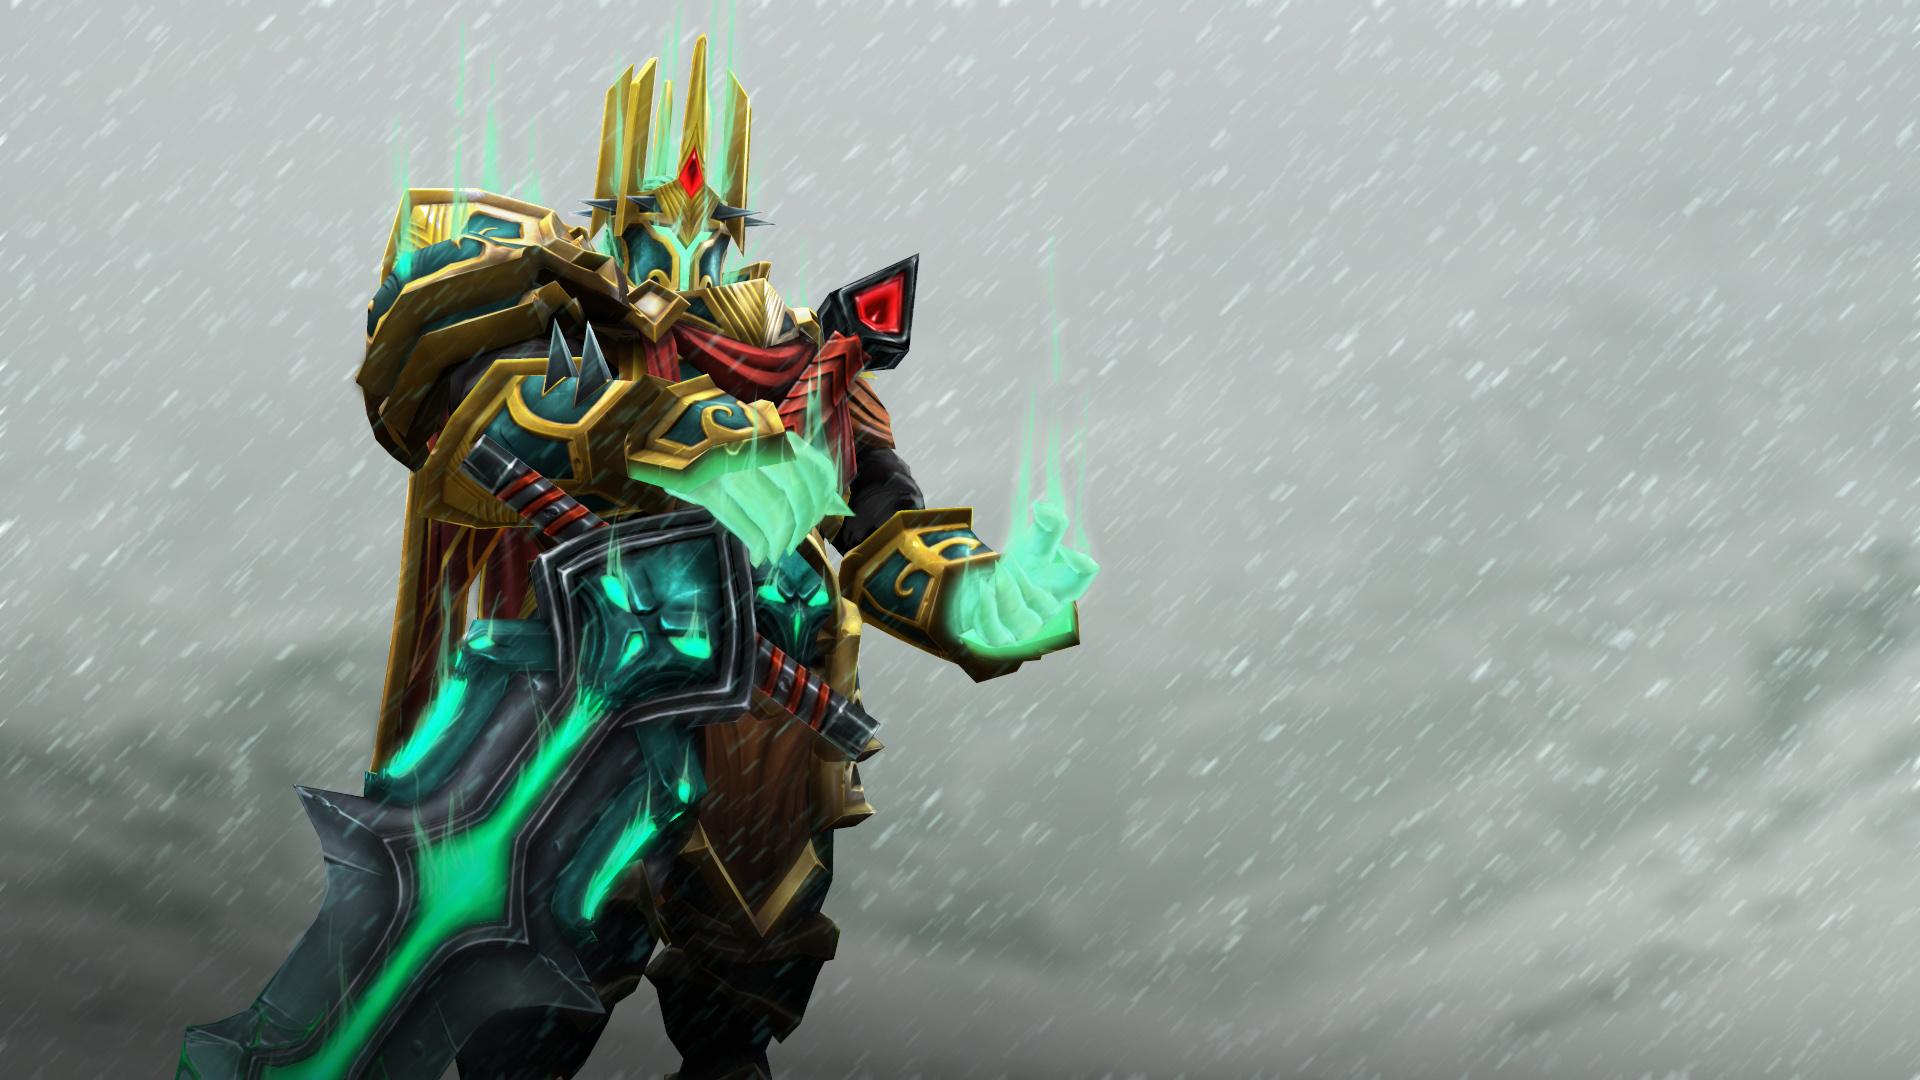 Dota 2 Wraith King Set Wallpaper HD